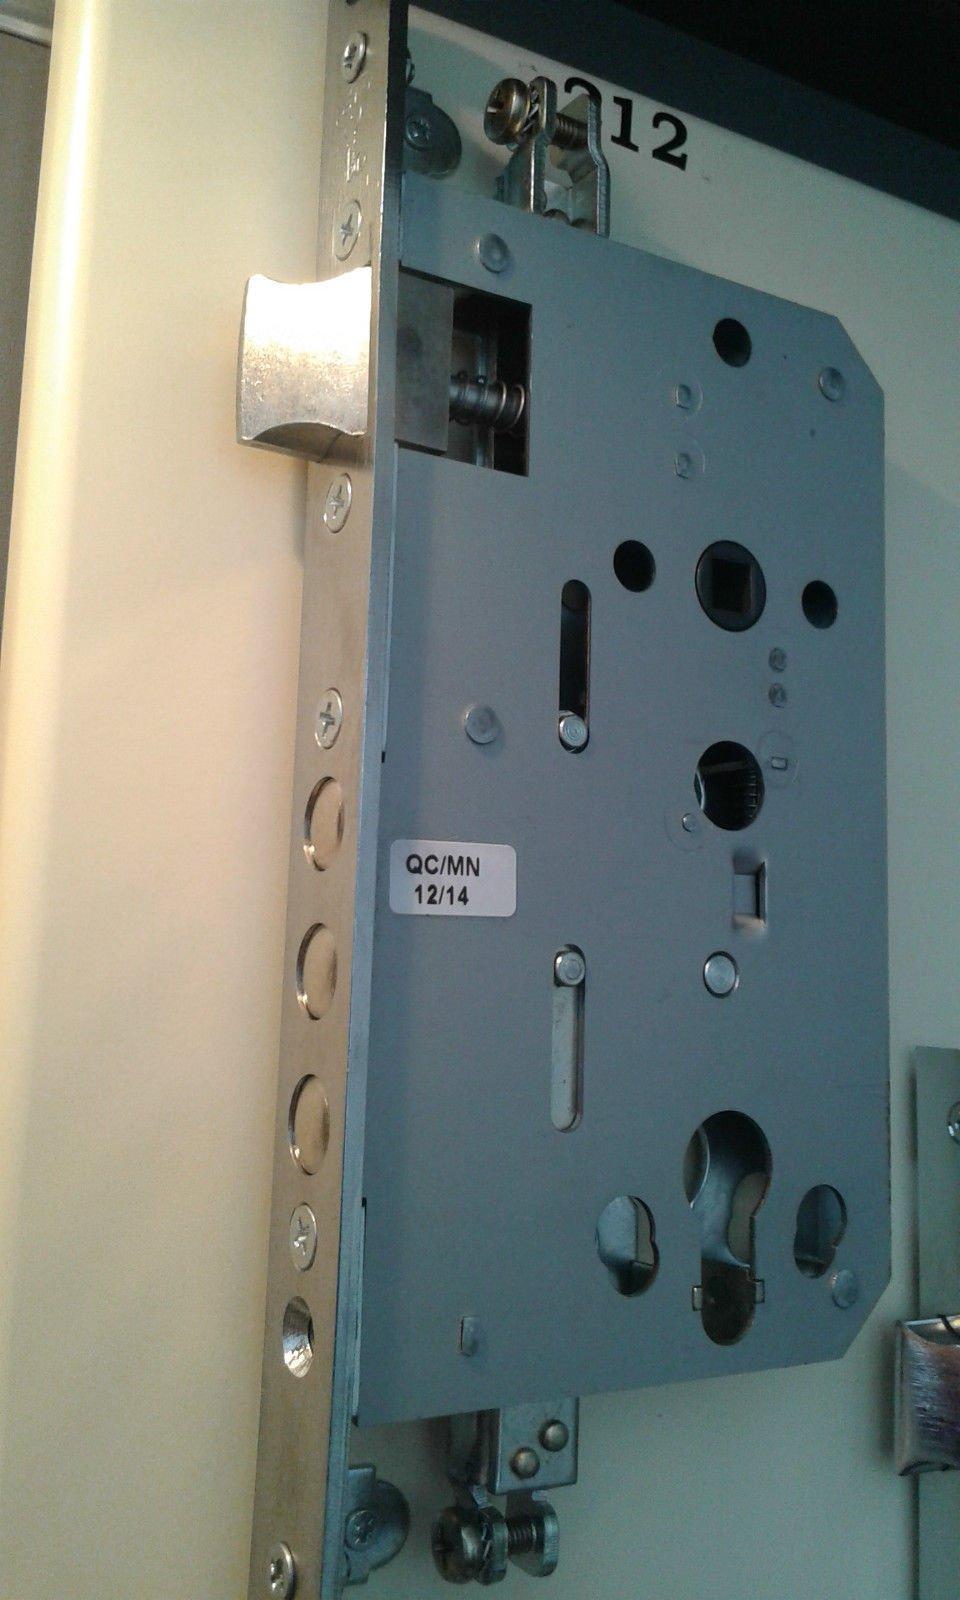 Mul-T-Lock MPL212 Security Lock Case 3 -Point Locking